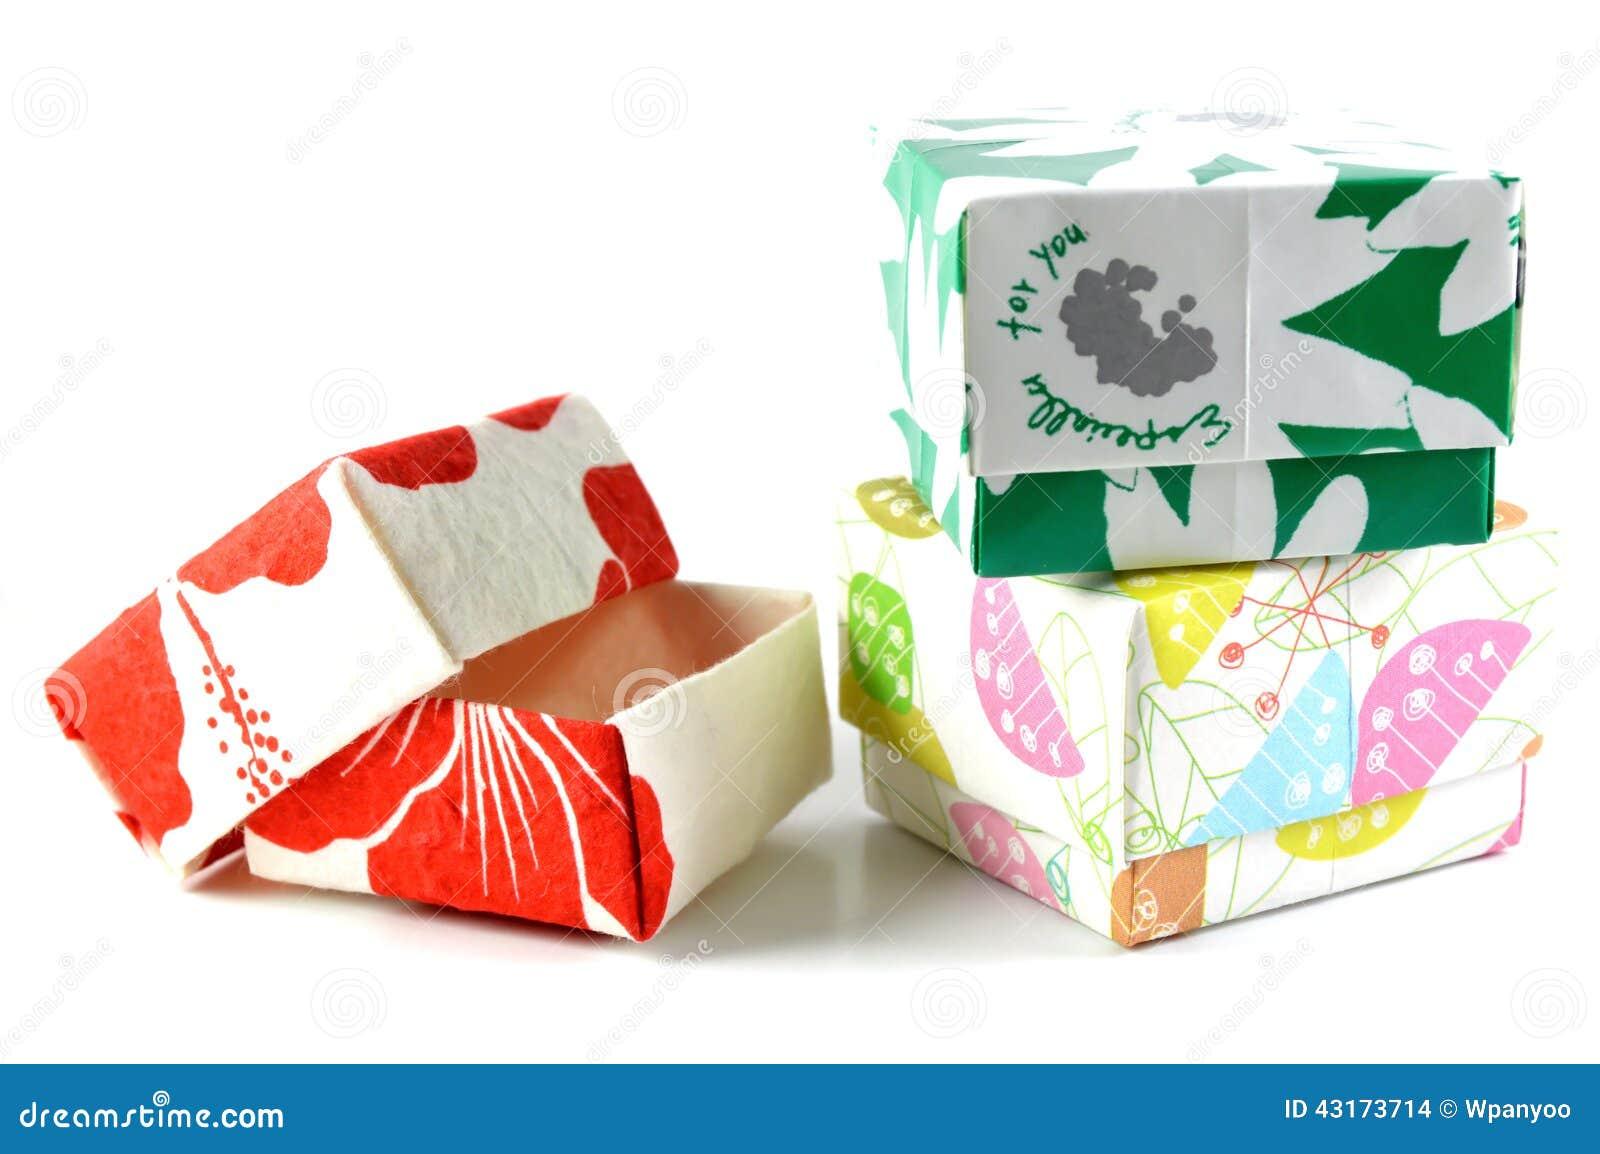 Origami box - photo#29